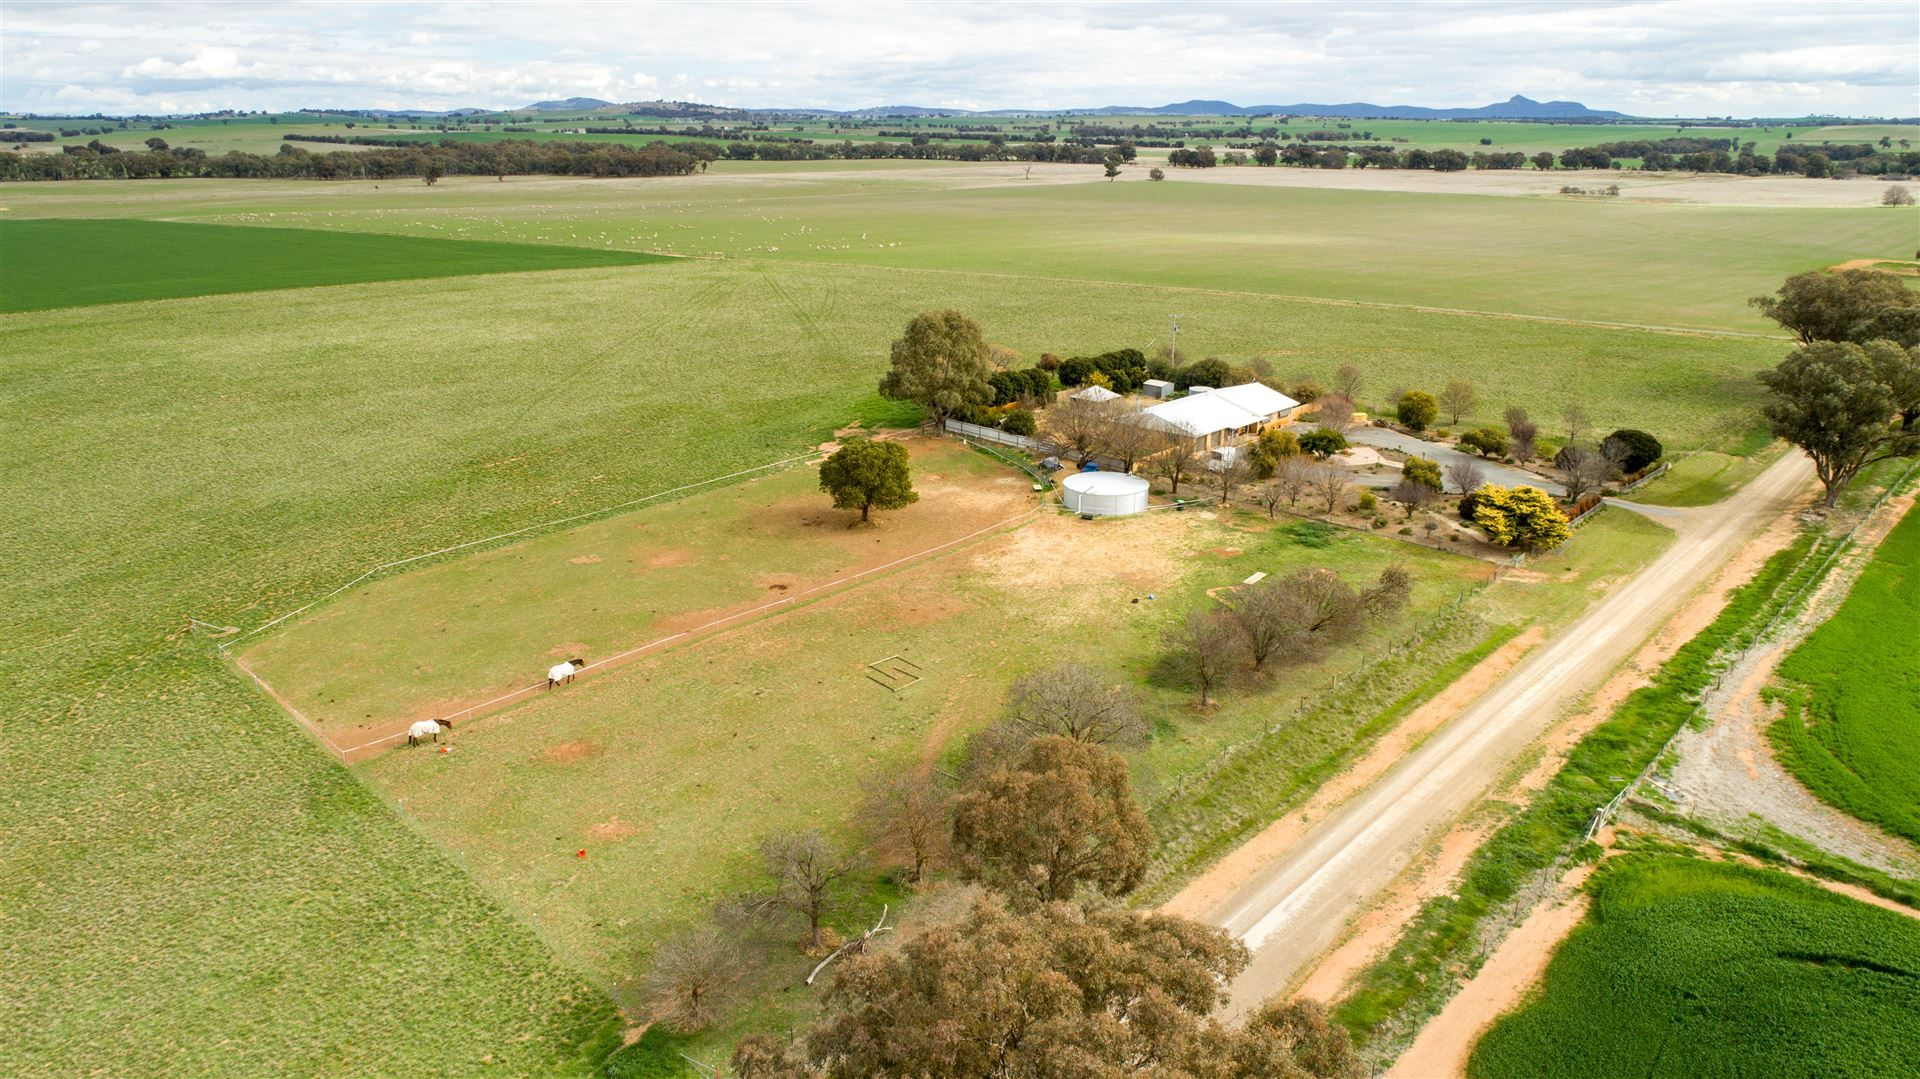 Currawalls Thirteen Mile Reserve Rd, Maxwell via, Wagga Wagga NSW 2650, Image 1